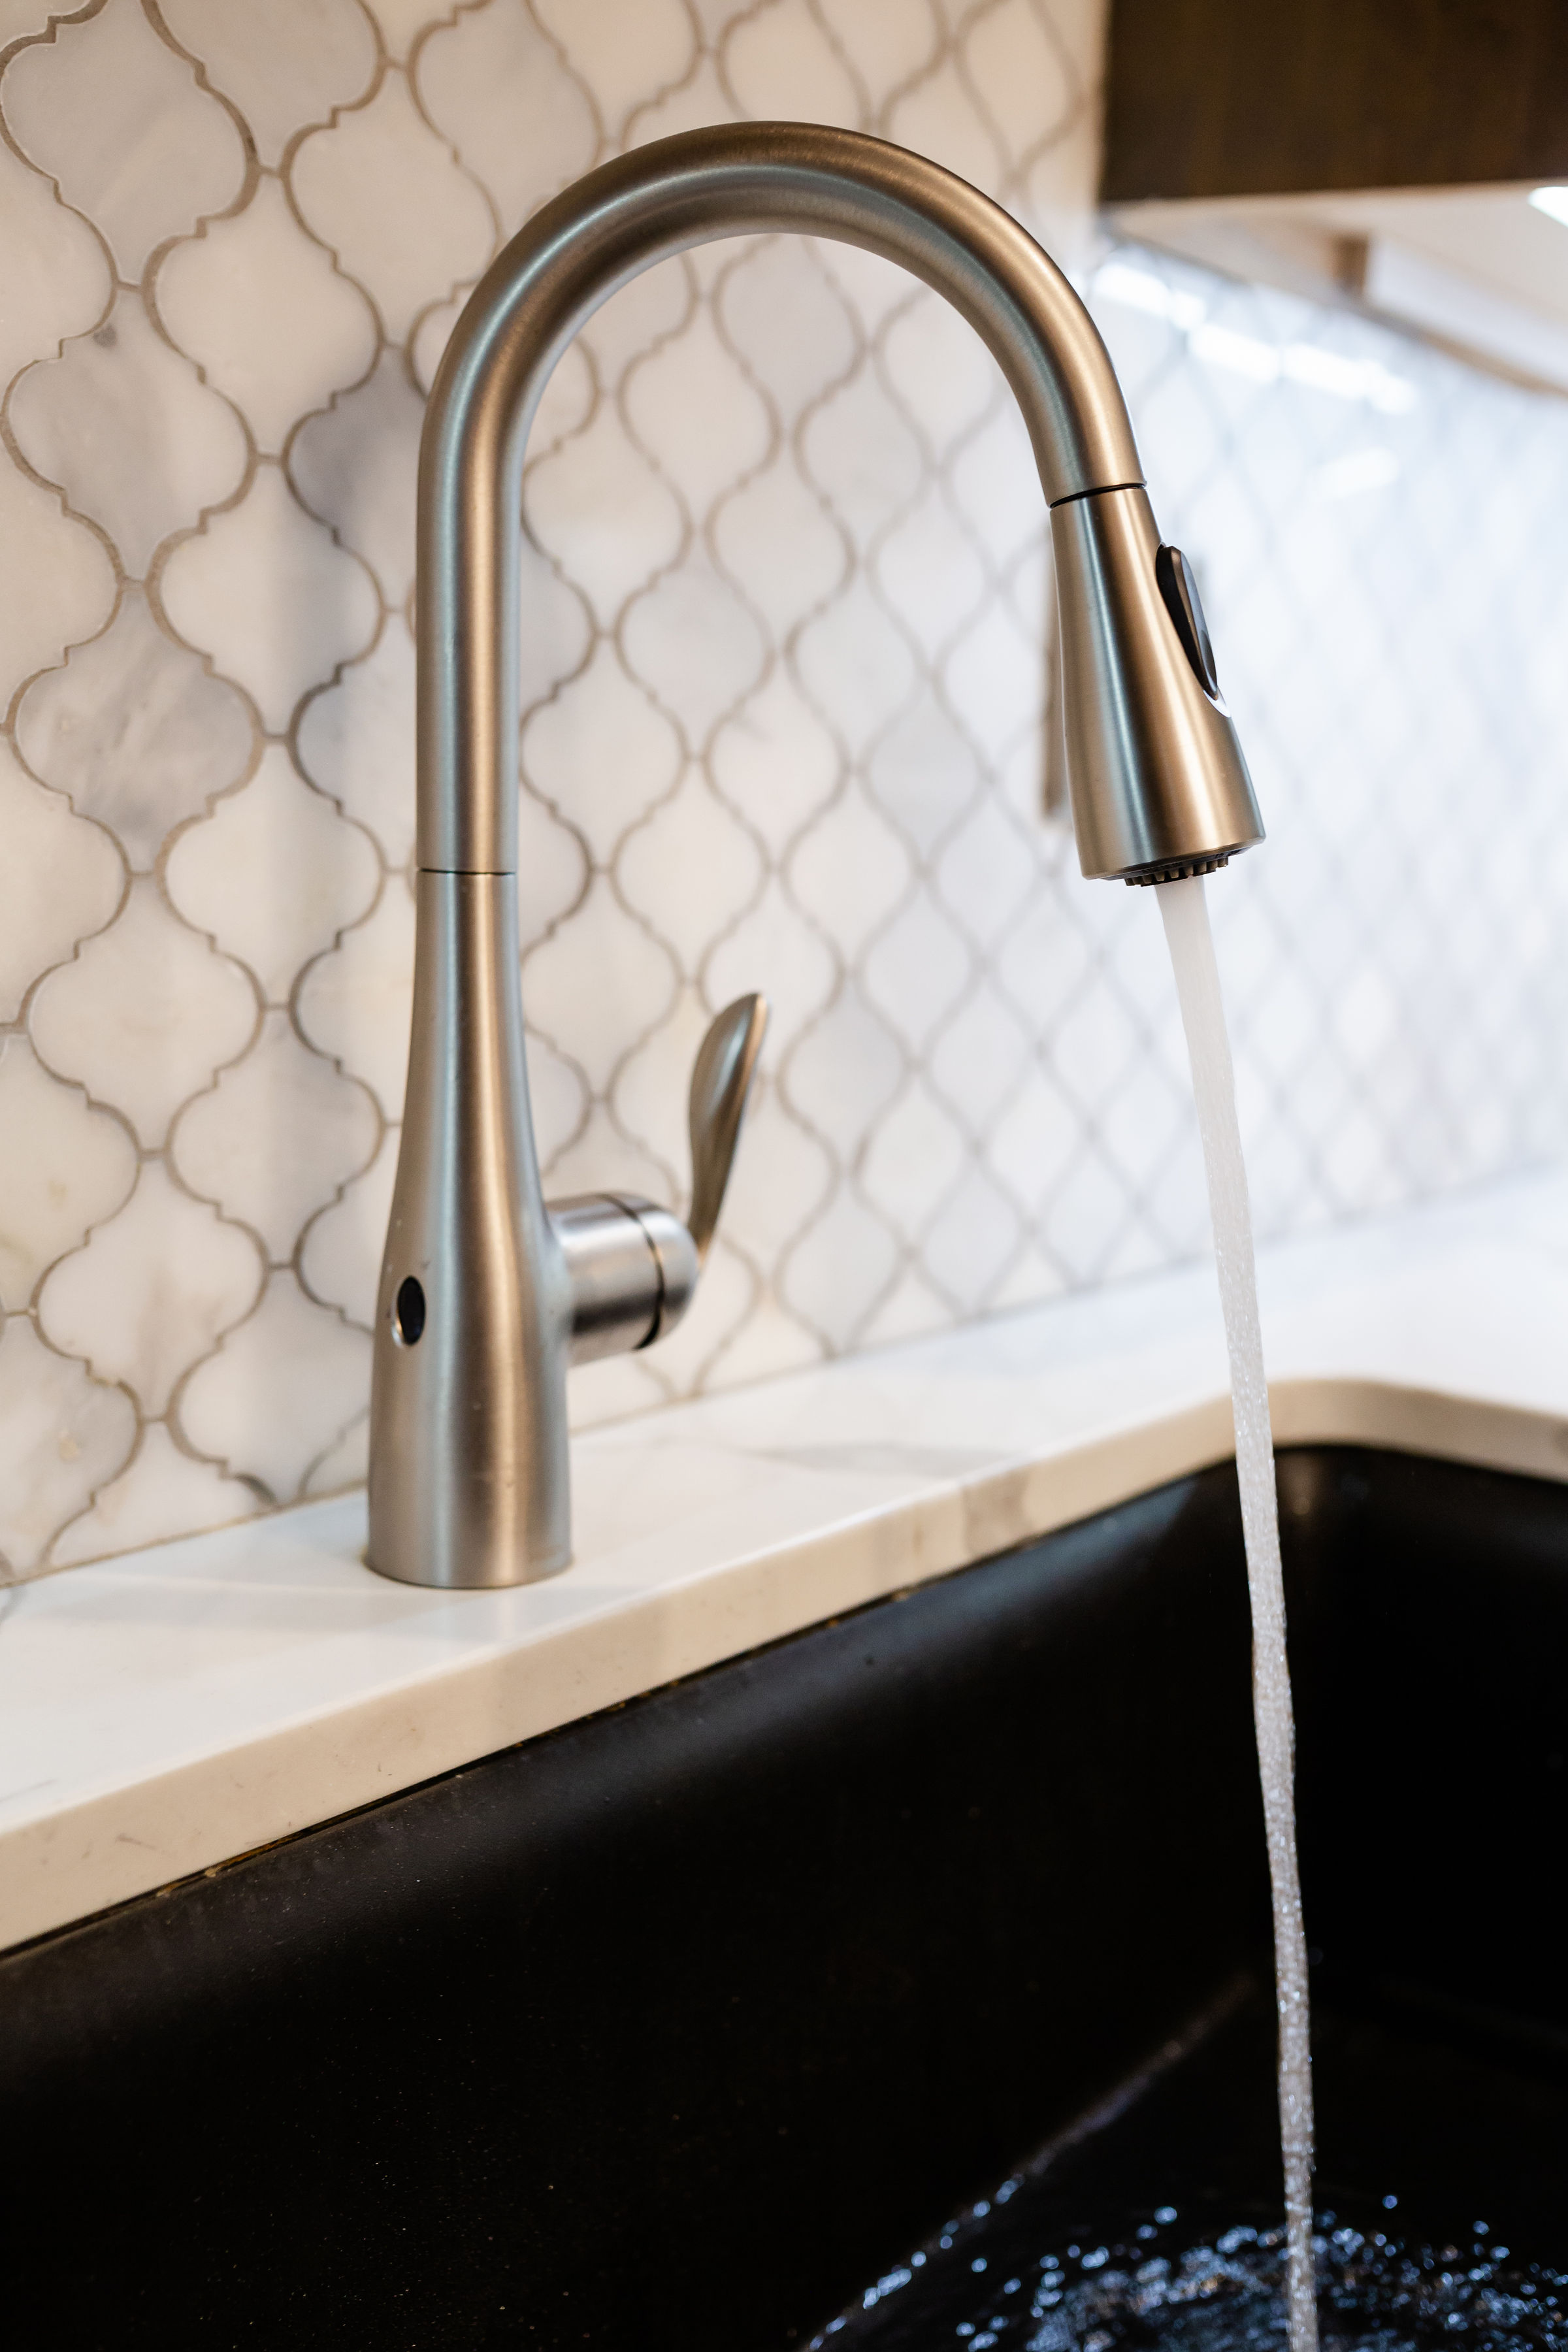 Moen Motionsense Kitchen Faucet Muse Kitchen And Bath